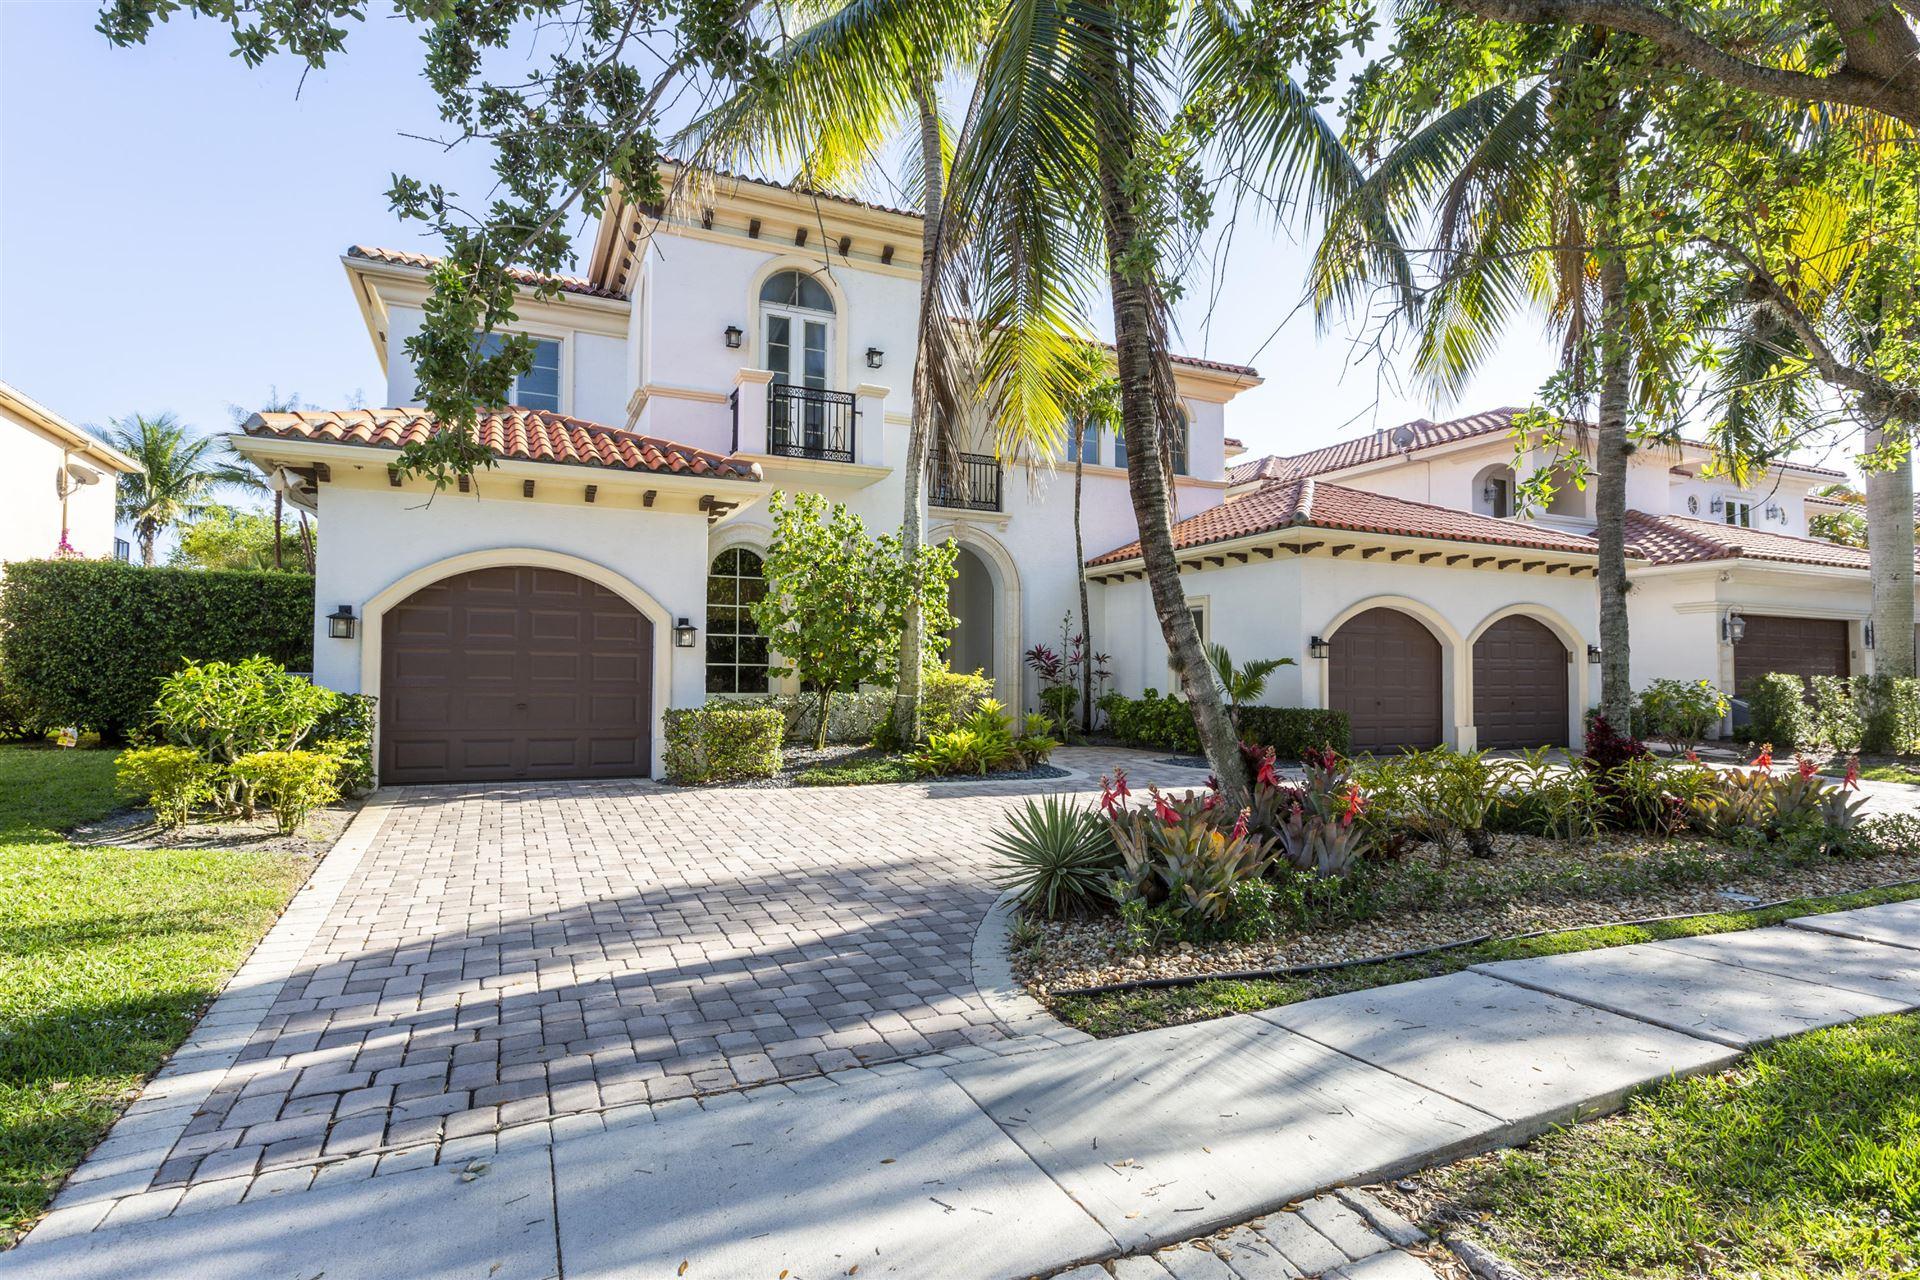 17706 Middlebrook Way, Boca Raton, FL 33496 - MLS#: RX-10718173